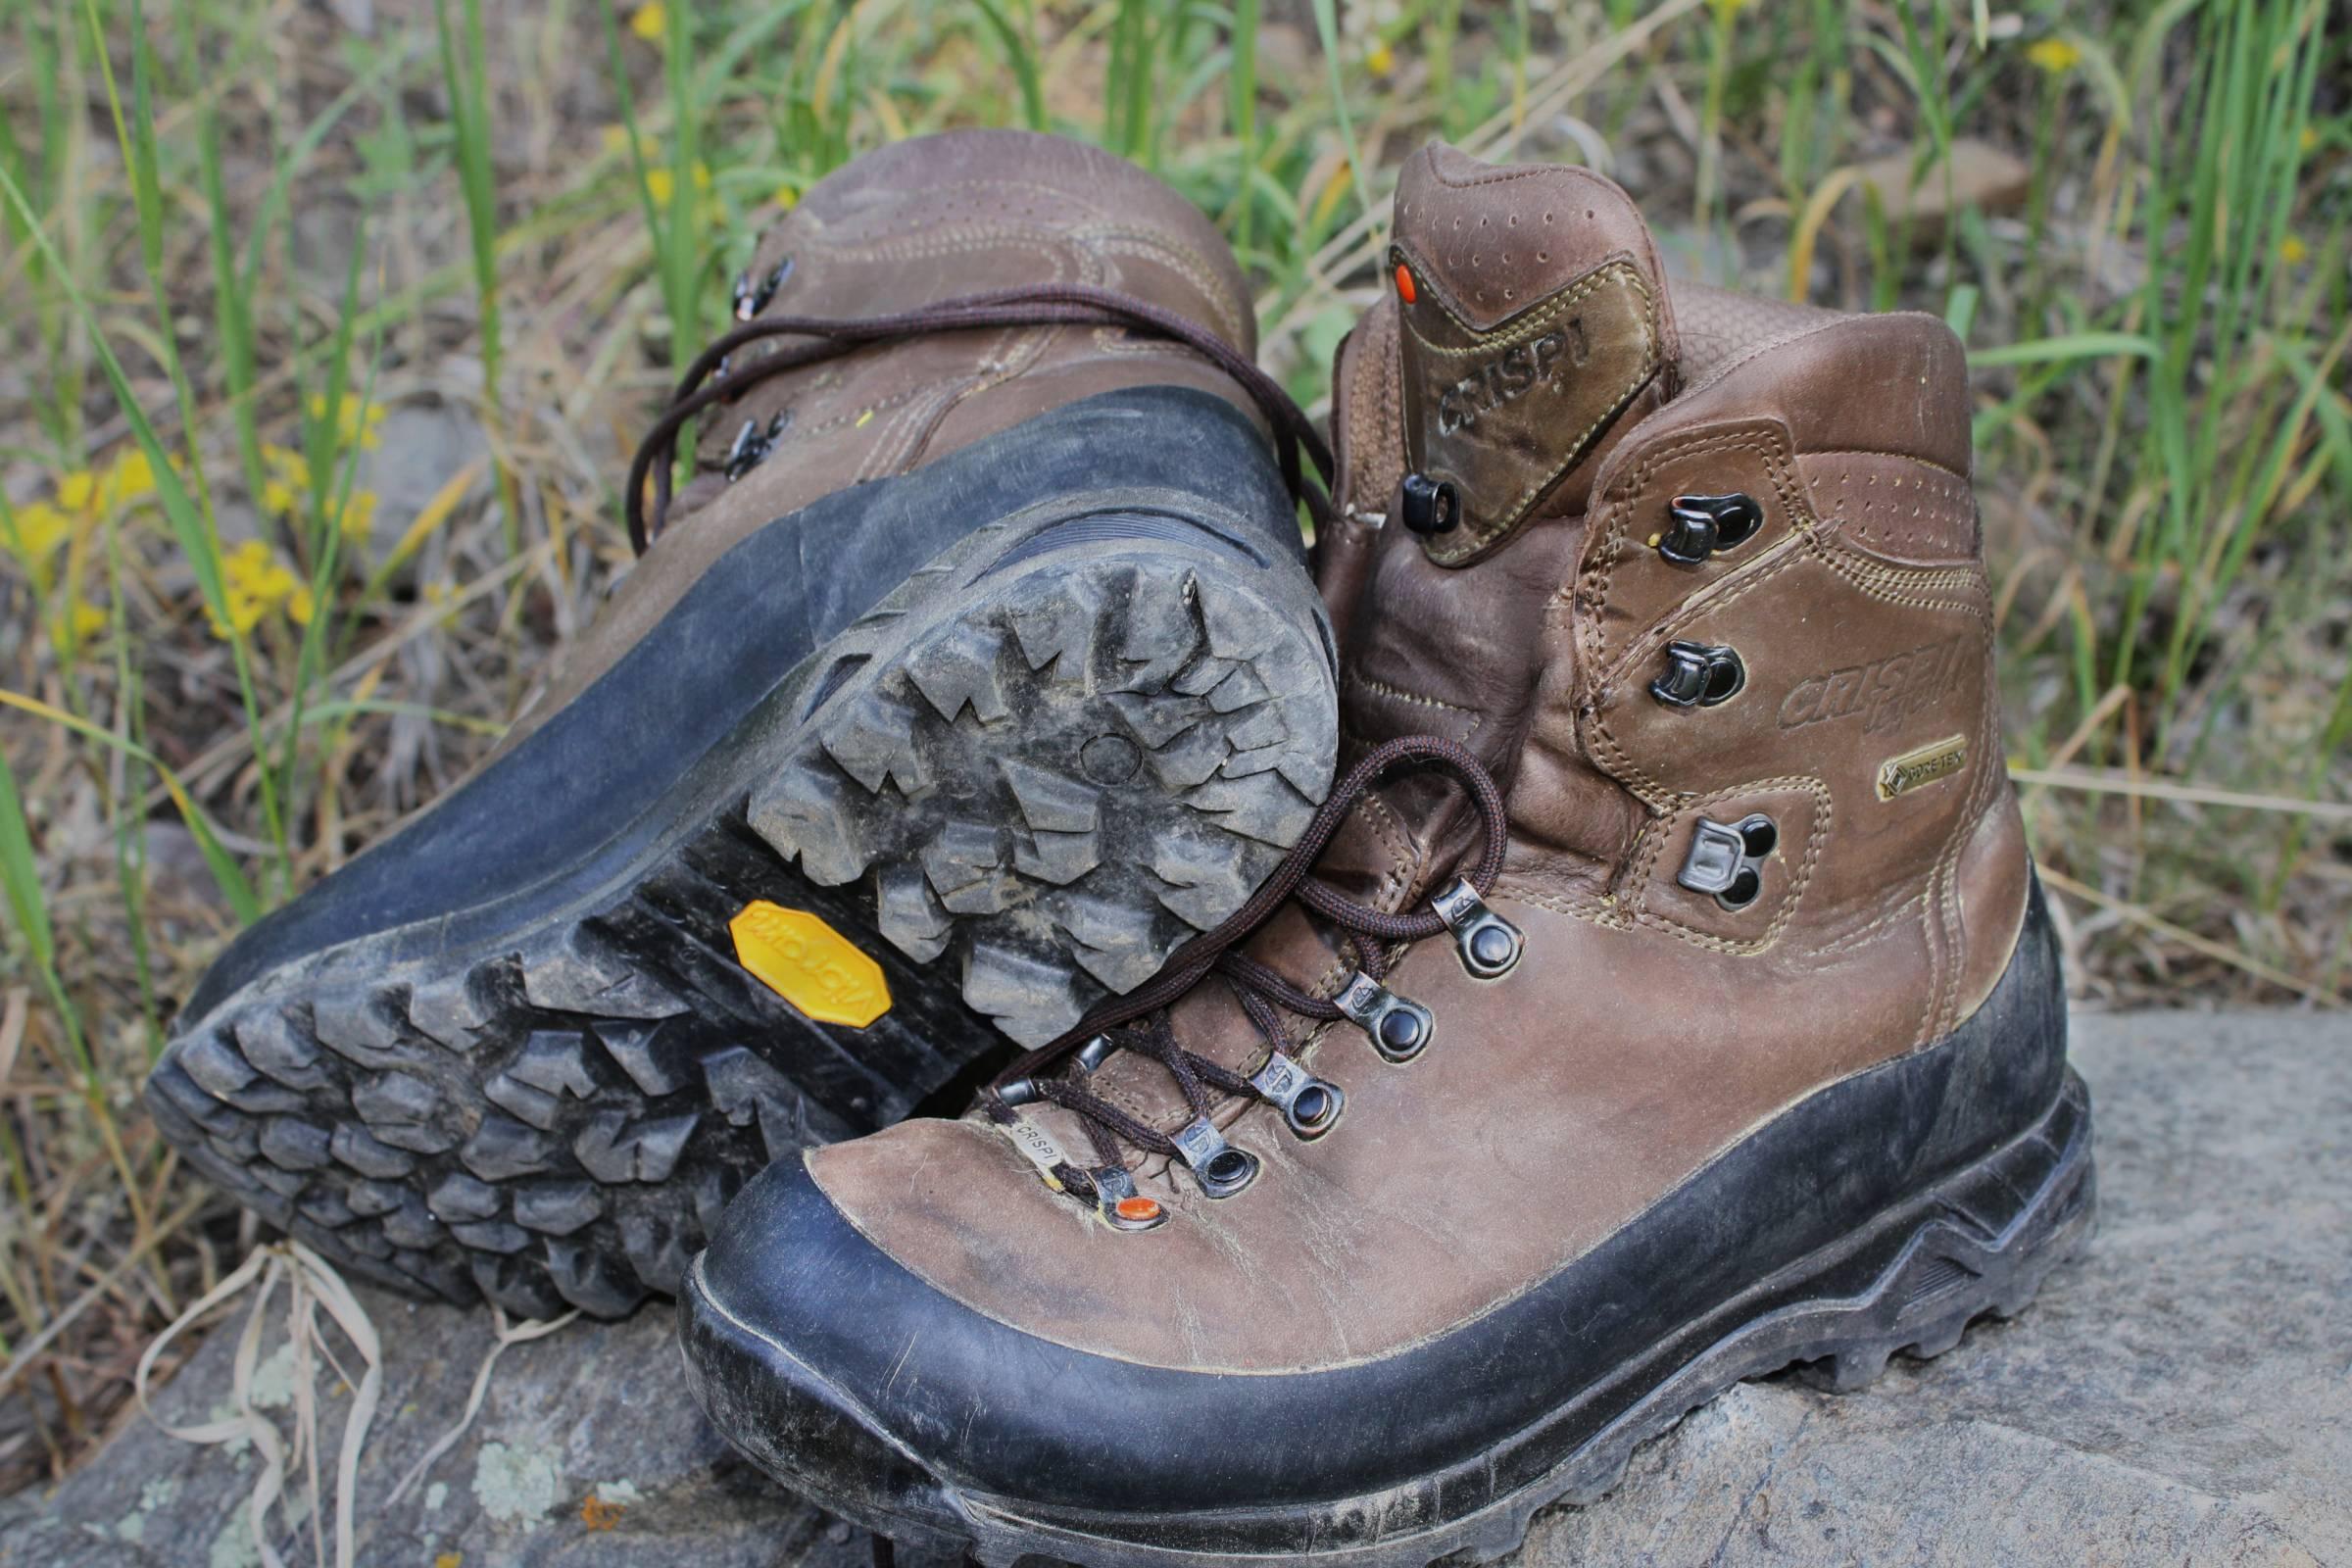 Crispi Nevada GTX Hunting Boot Review